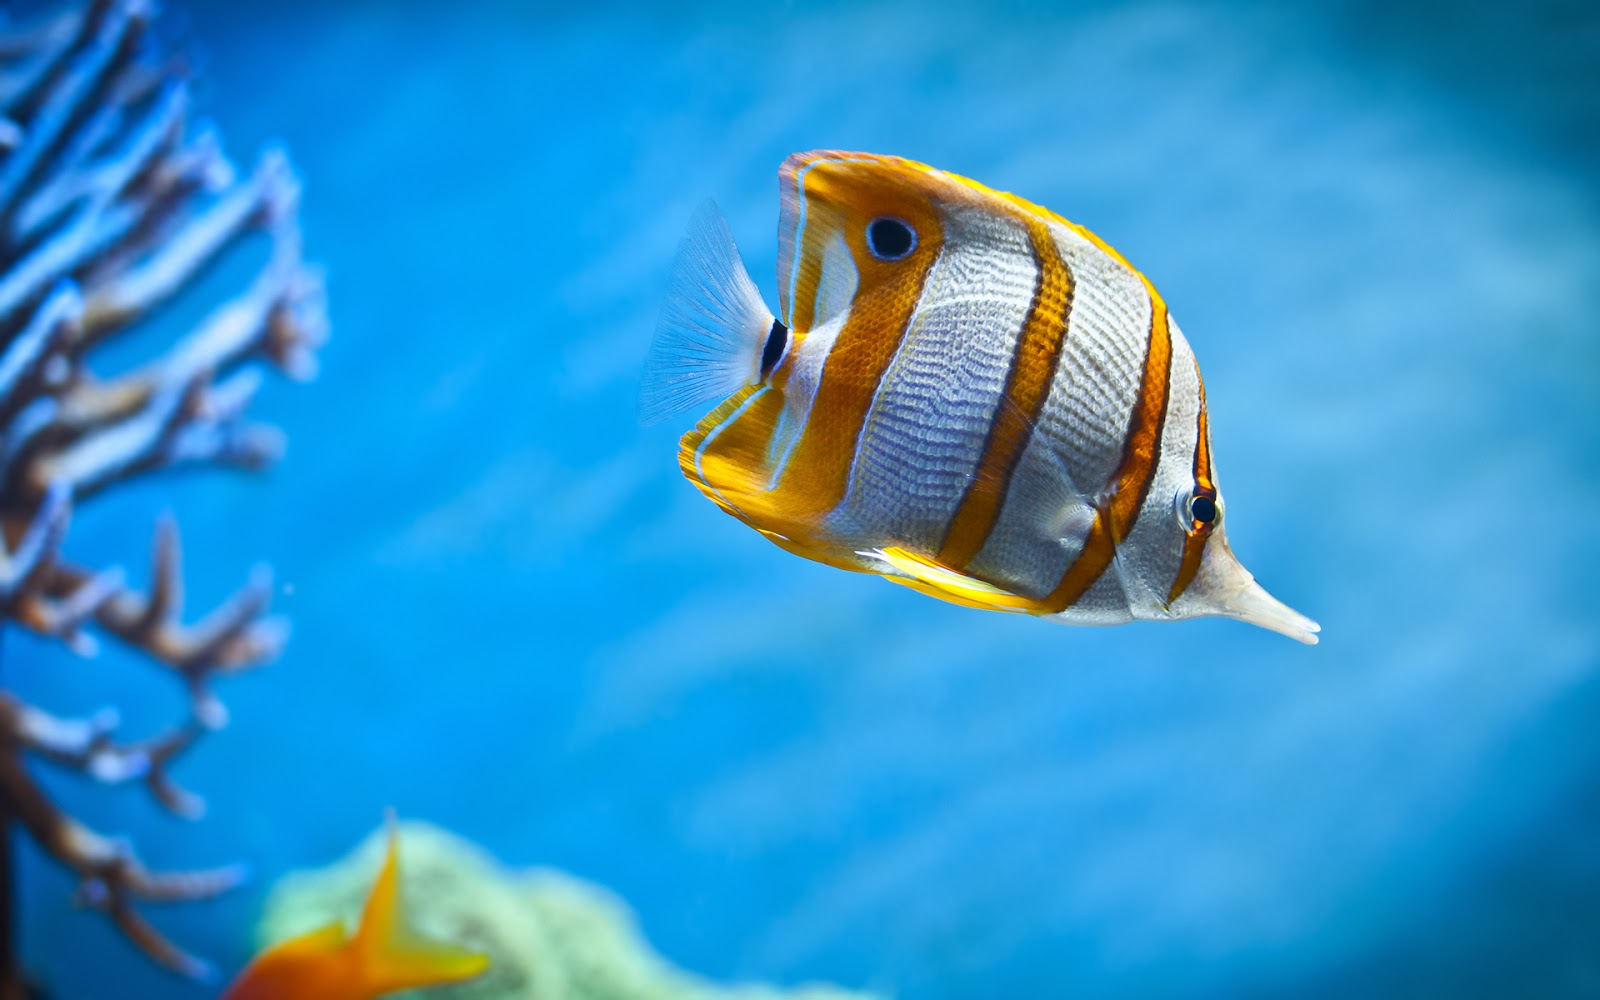 "<img src=""http://2.bp.blogspot.com/-g3kIRKlsTbM/UtmQ0mmTyCI/AAAAAAAAIqA/mFM3ADGmHyw/s1600/copperband-butterfly-fish.jpg"" alt=""butterfly fish"" />"